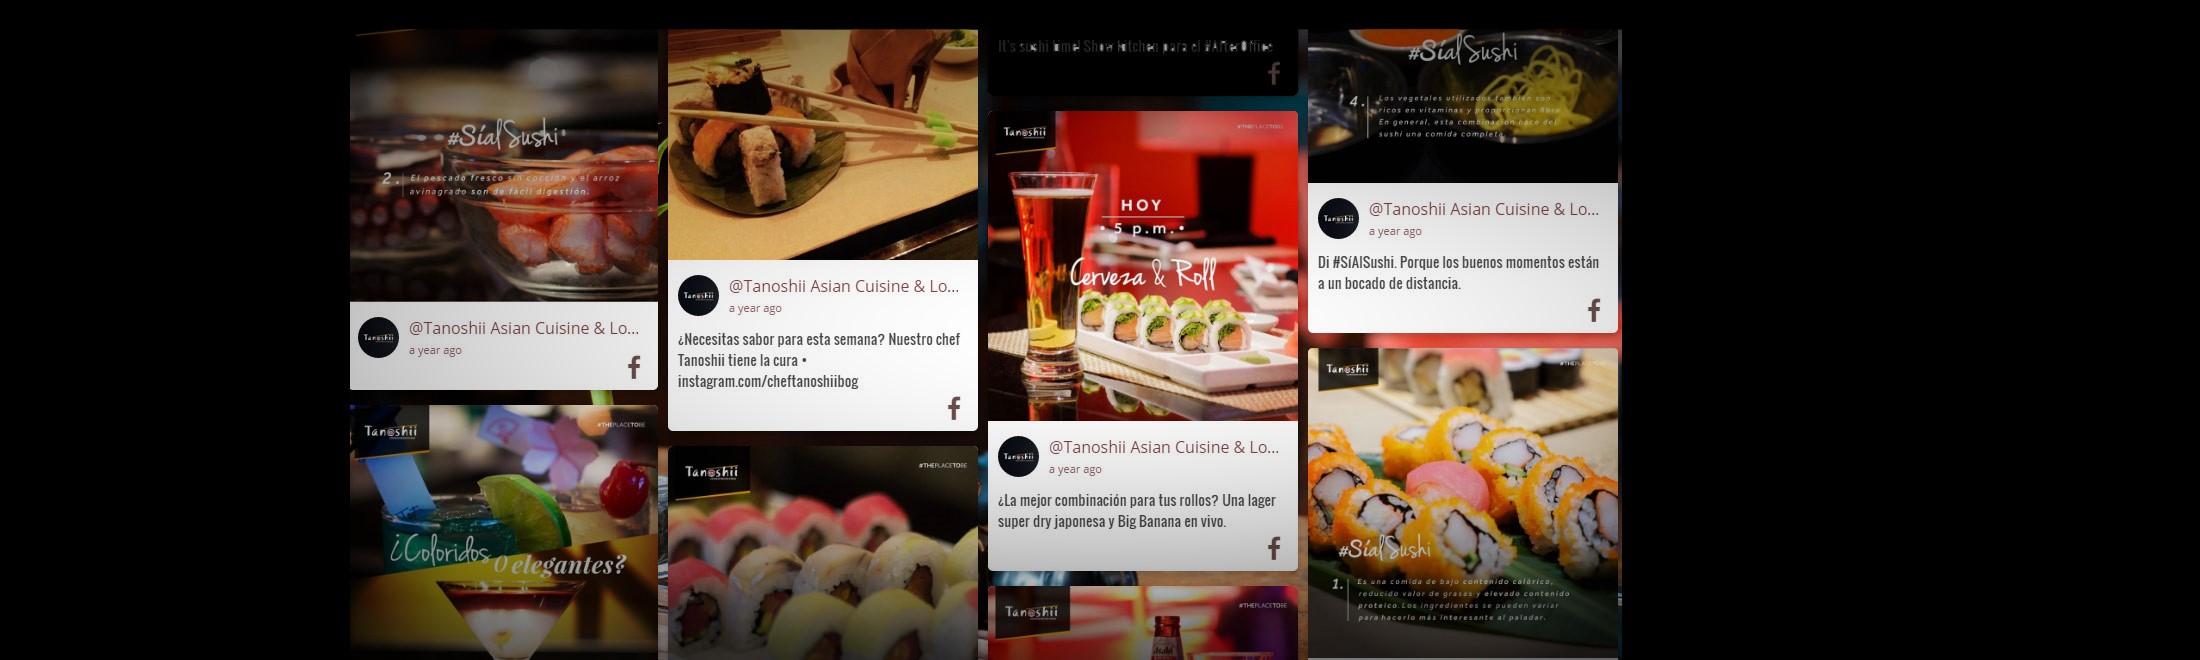 socialwall-for-blog-photo (2)